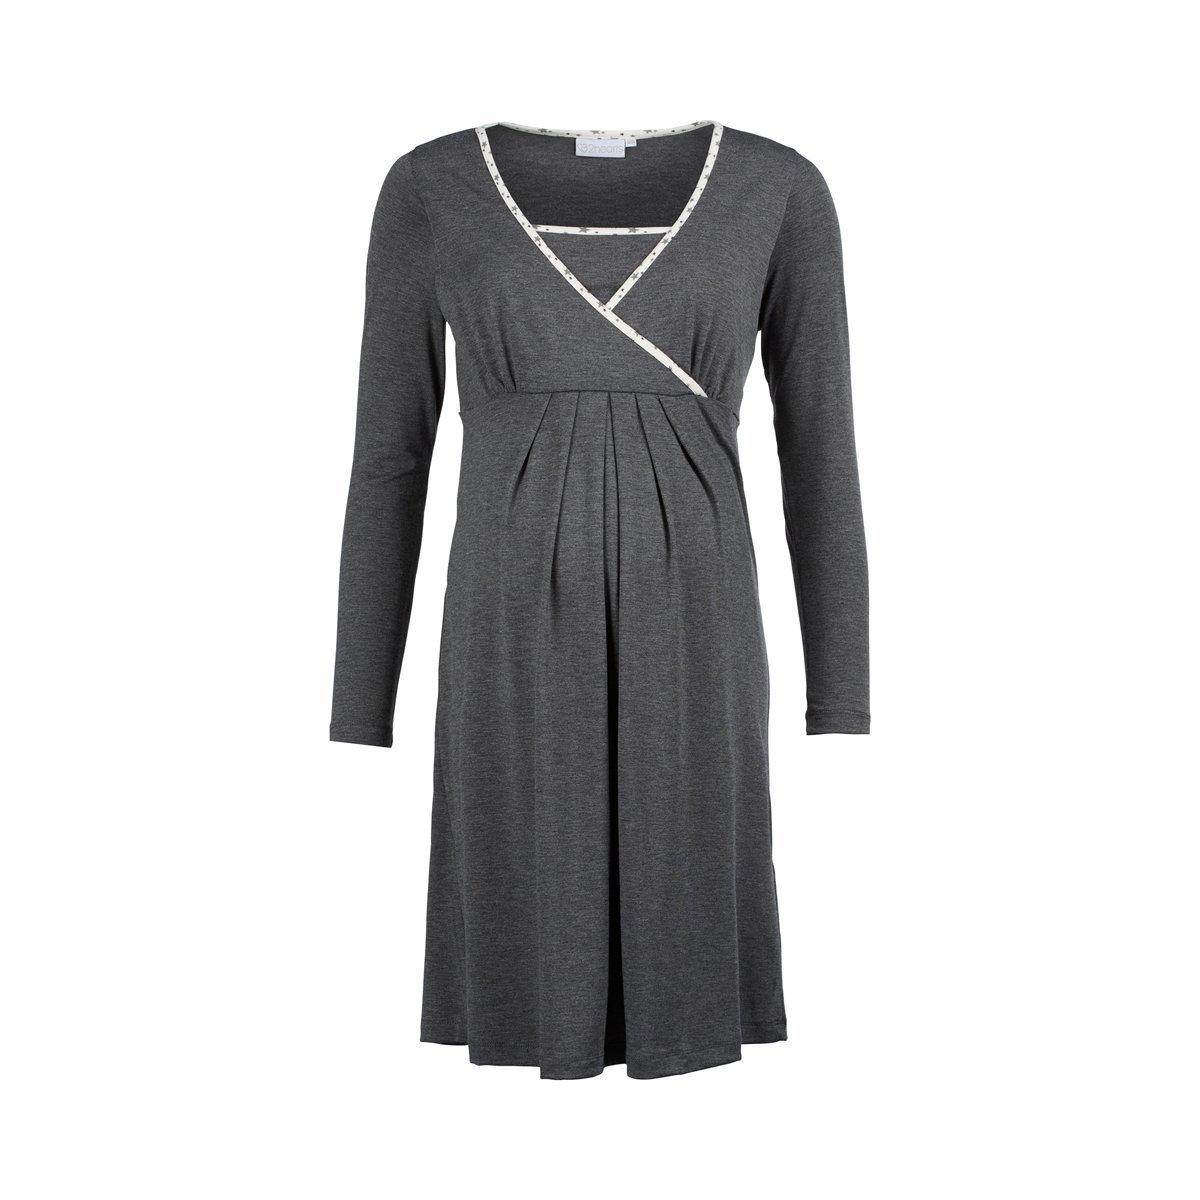 2HEARTS We love basics Still-Nachthemd langarm grau/Damen Schlafanzug/Nachtkleid / Sleepshirt